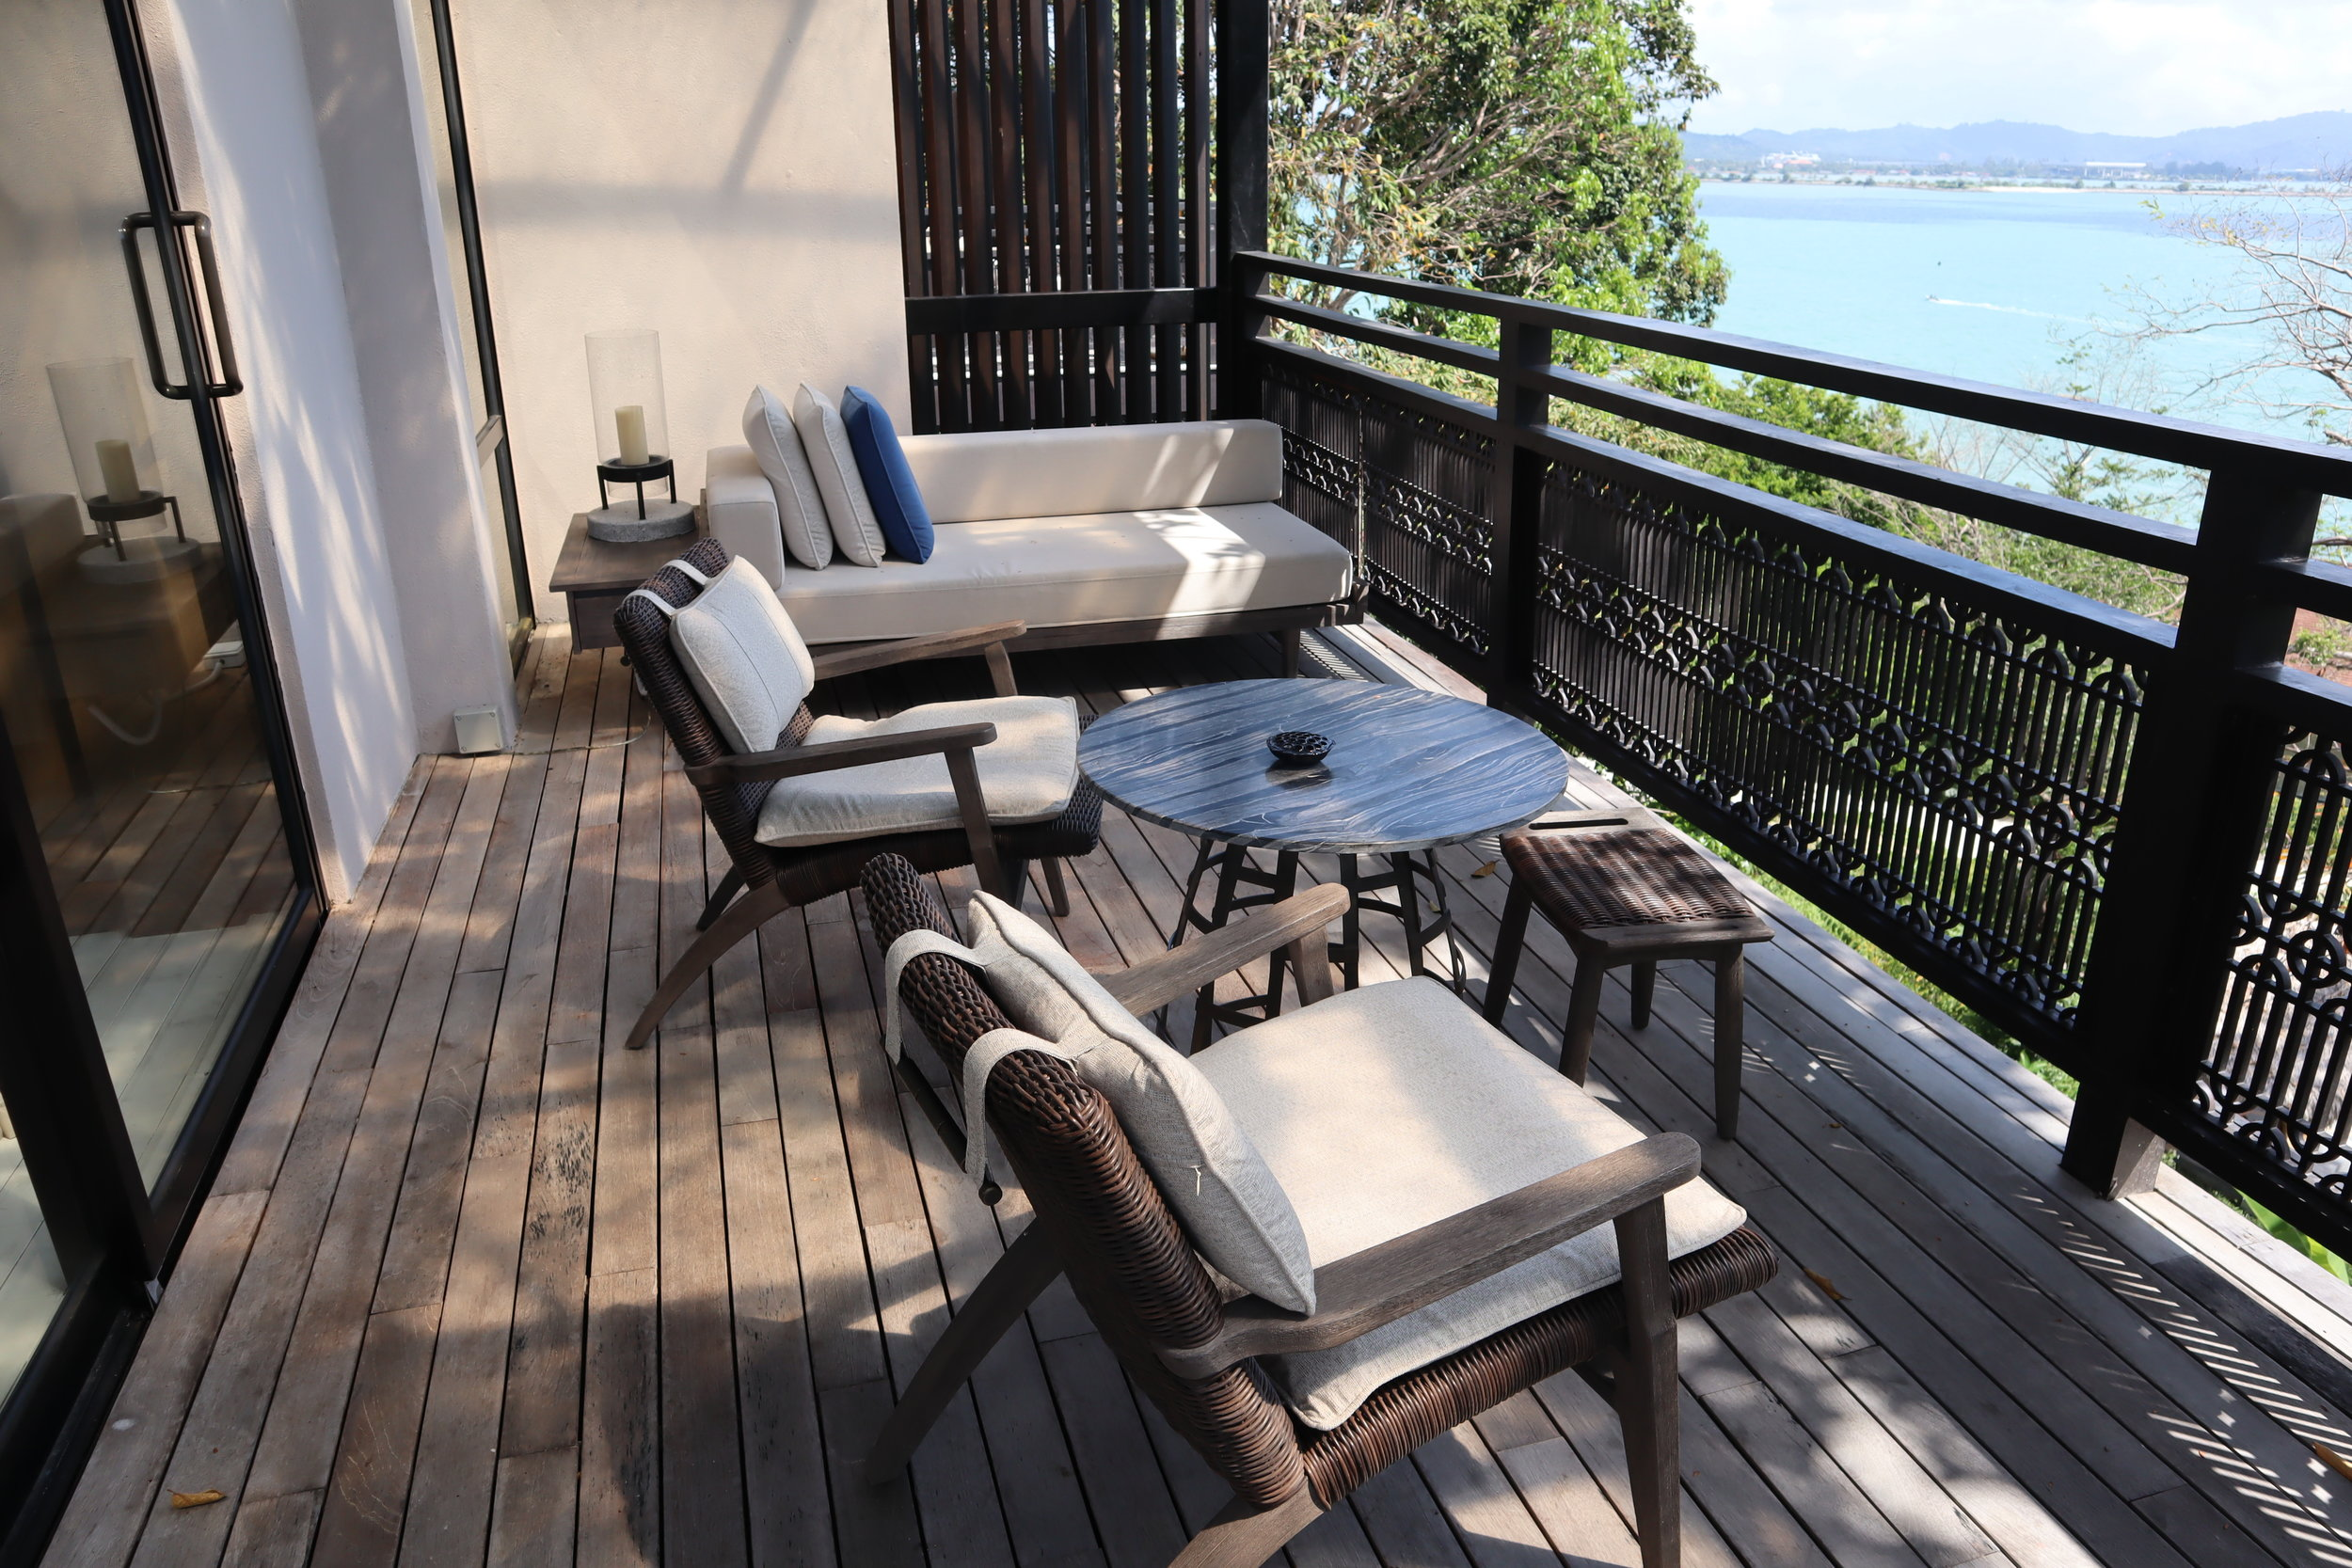 The Ritz-Carlton, Langkawi – Rainforest Junior Suite balcony